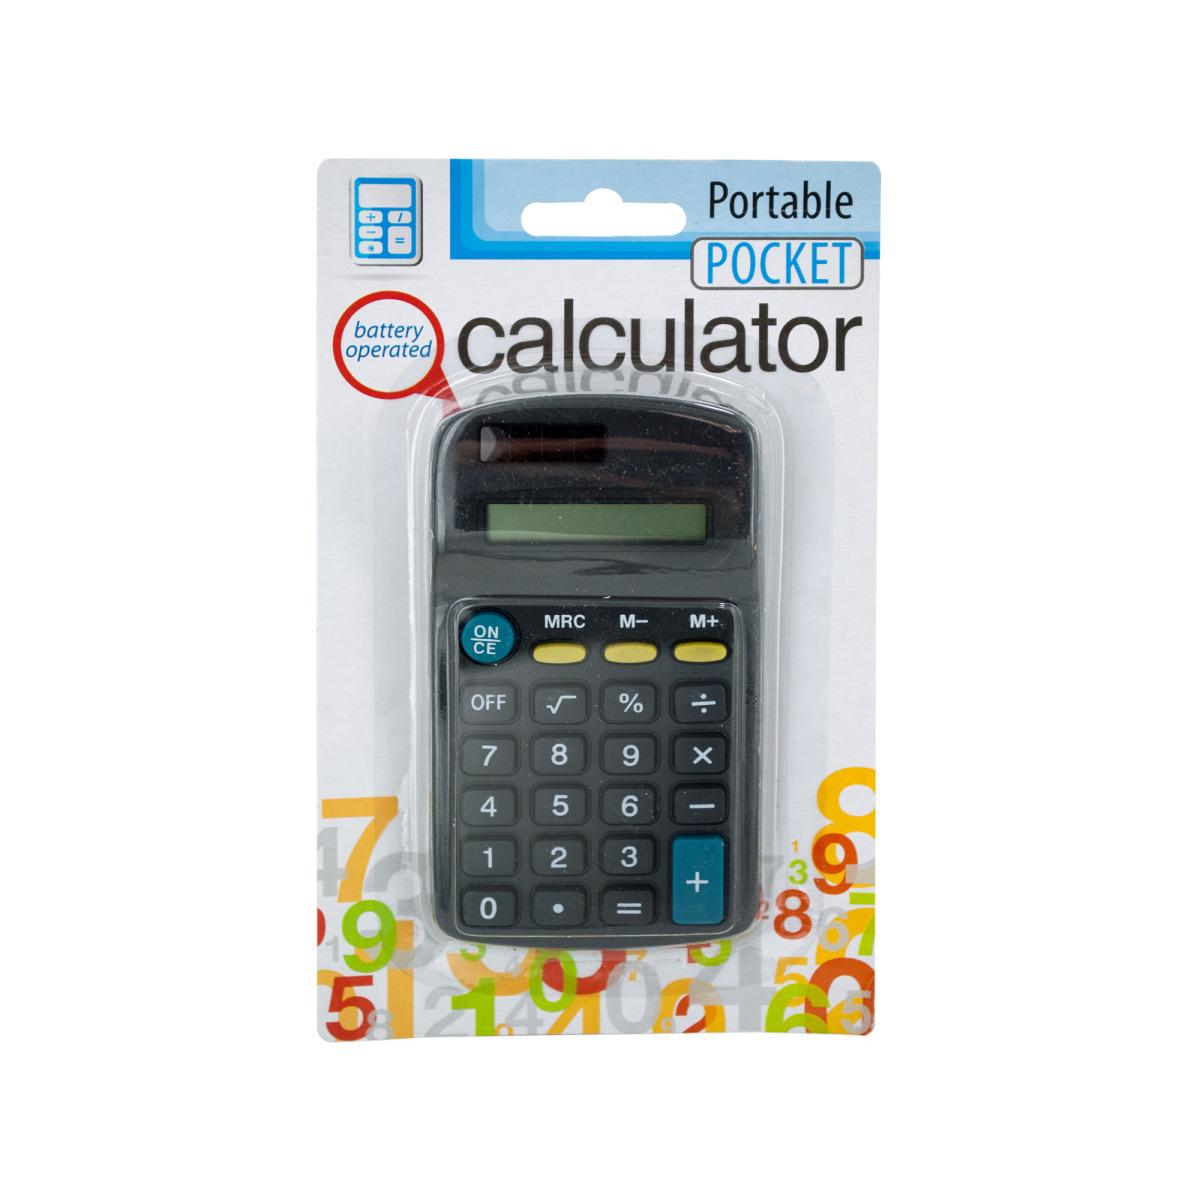 Portable Pocket CALCULATOR Style #695L [1765898]